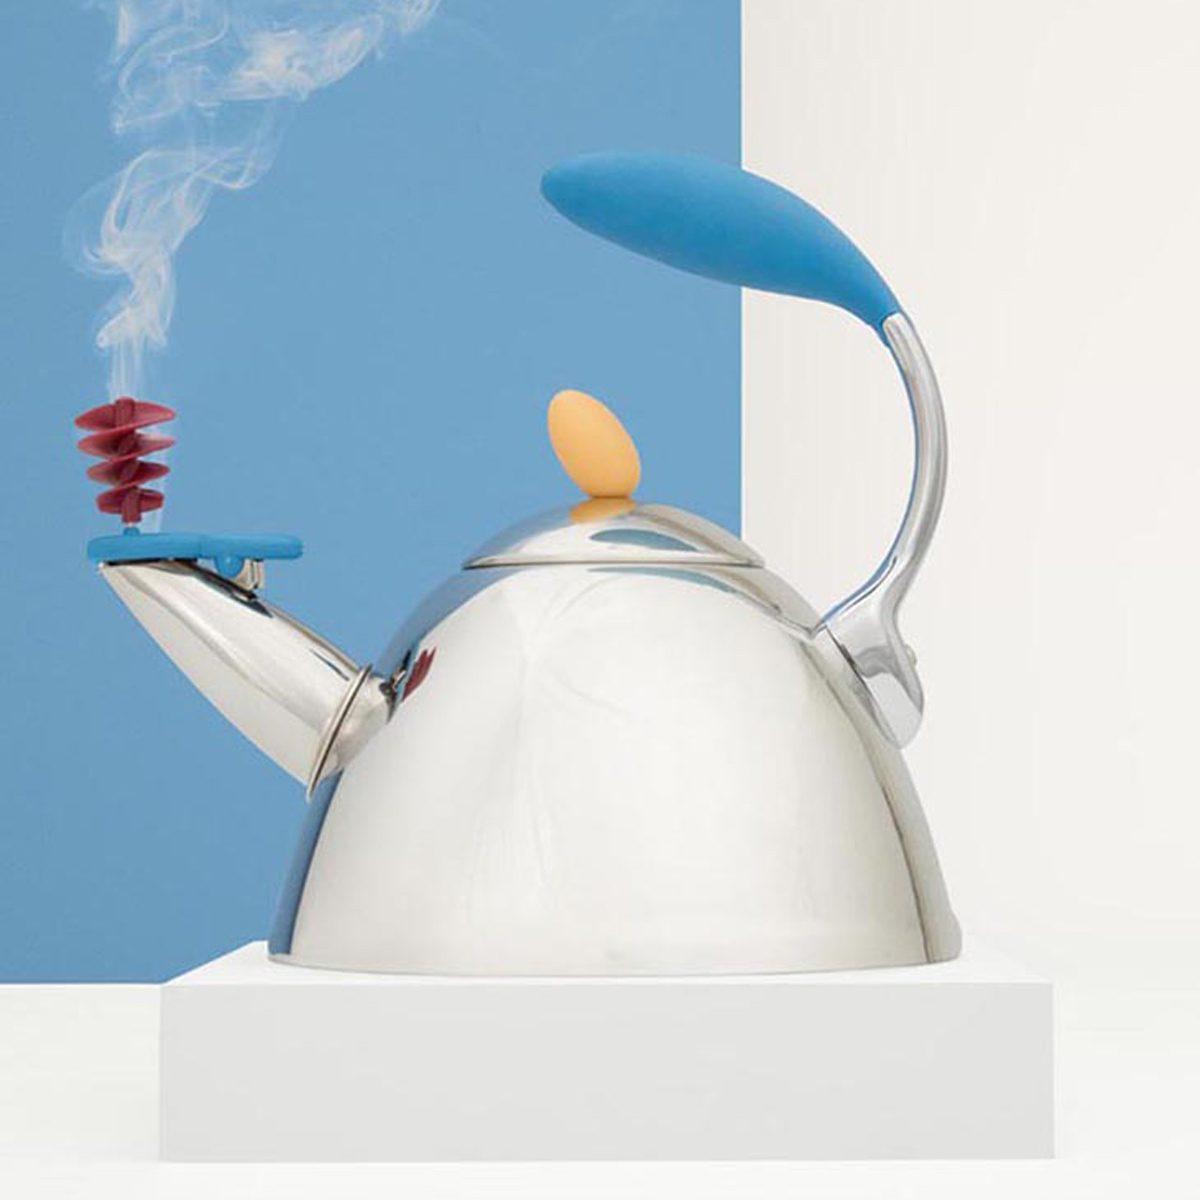 Target design anniversary tea kettle